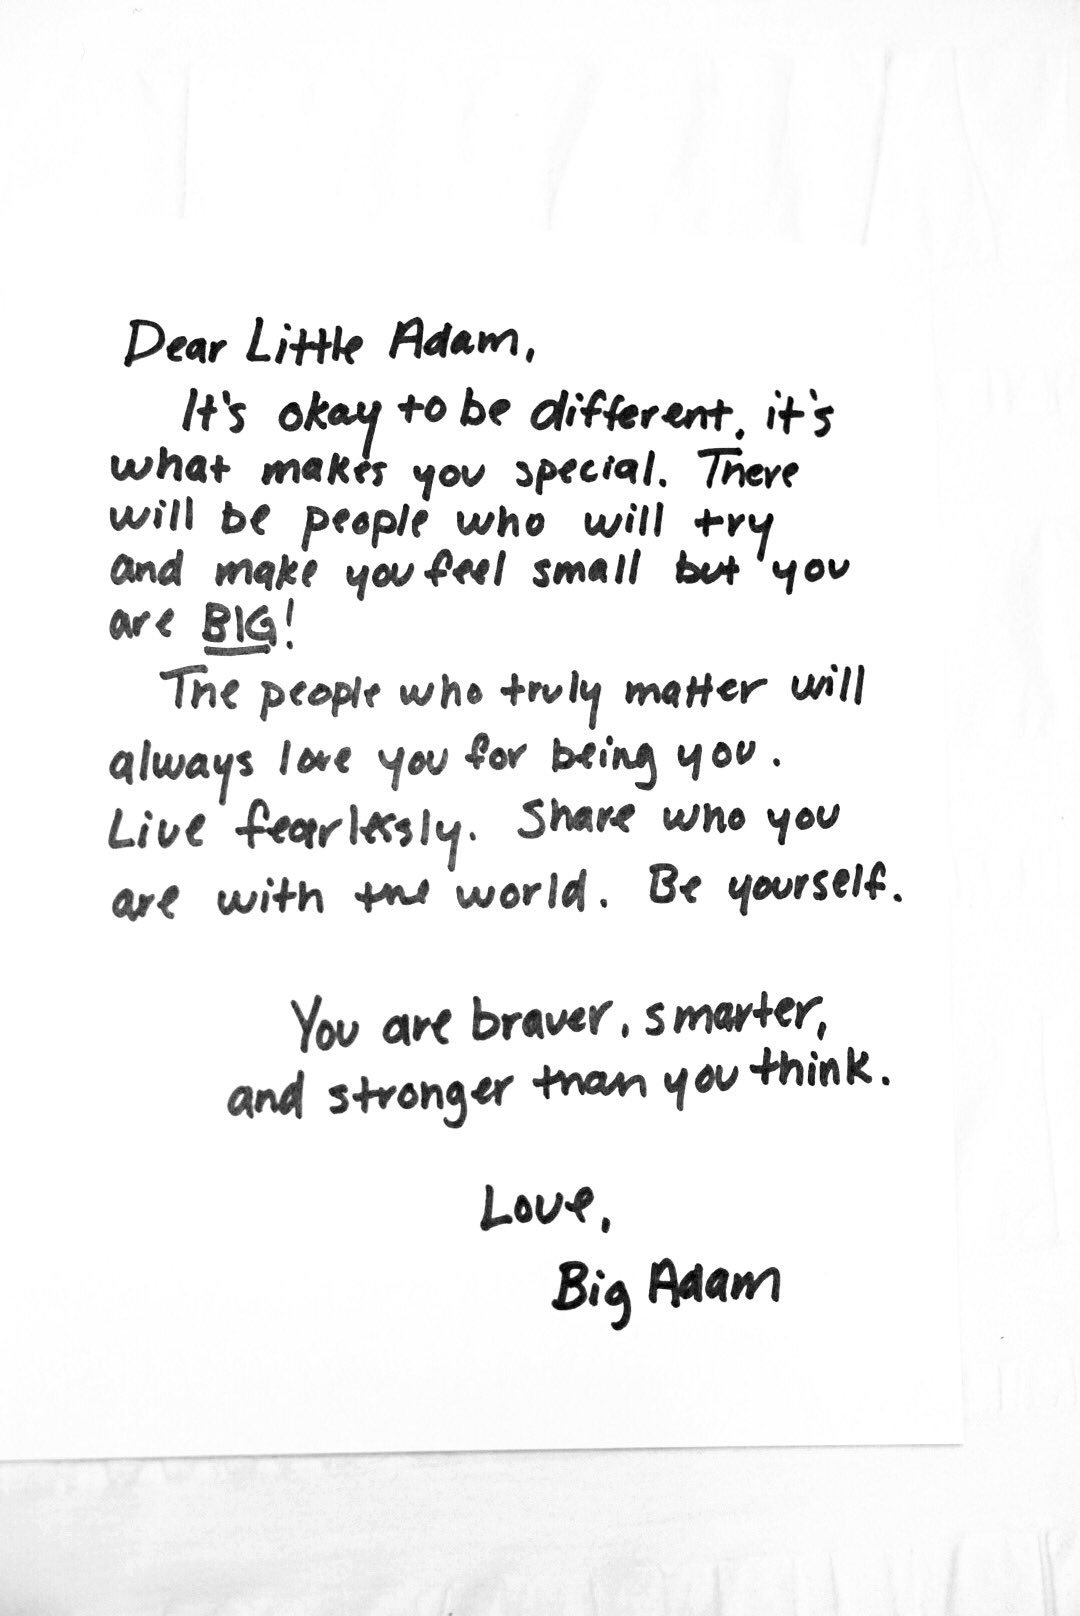 Dear Little Adam #nationalcomingoutday ��️�� https://t.co/d9LUZq2TyT